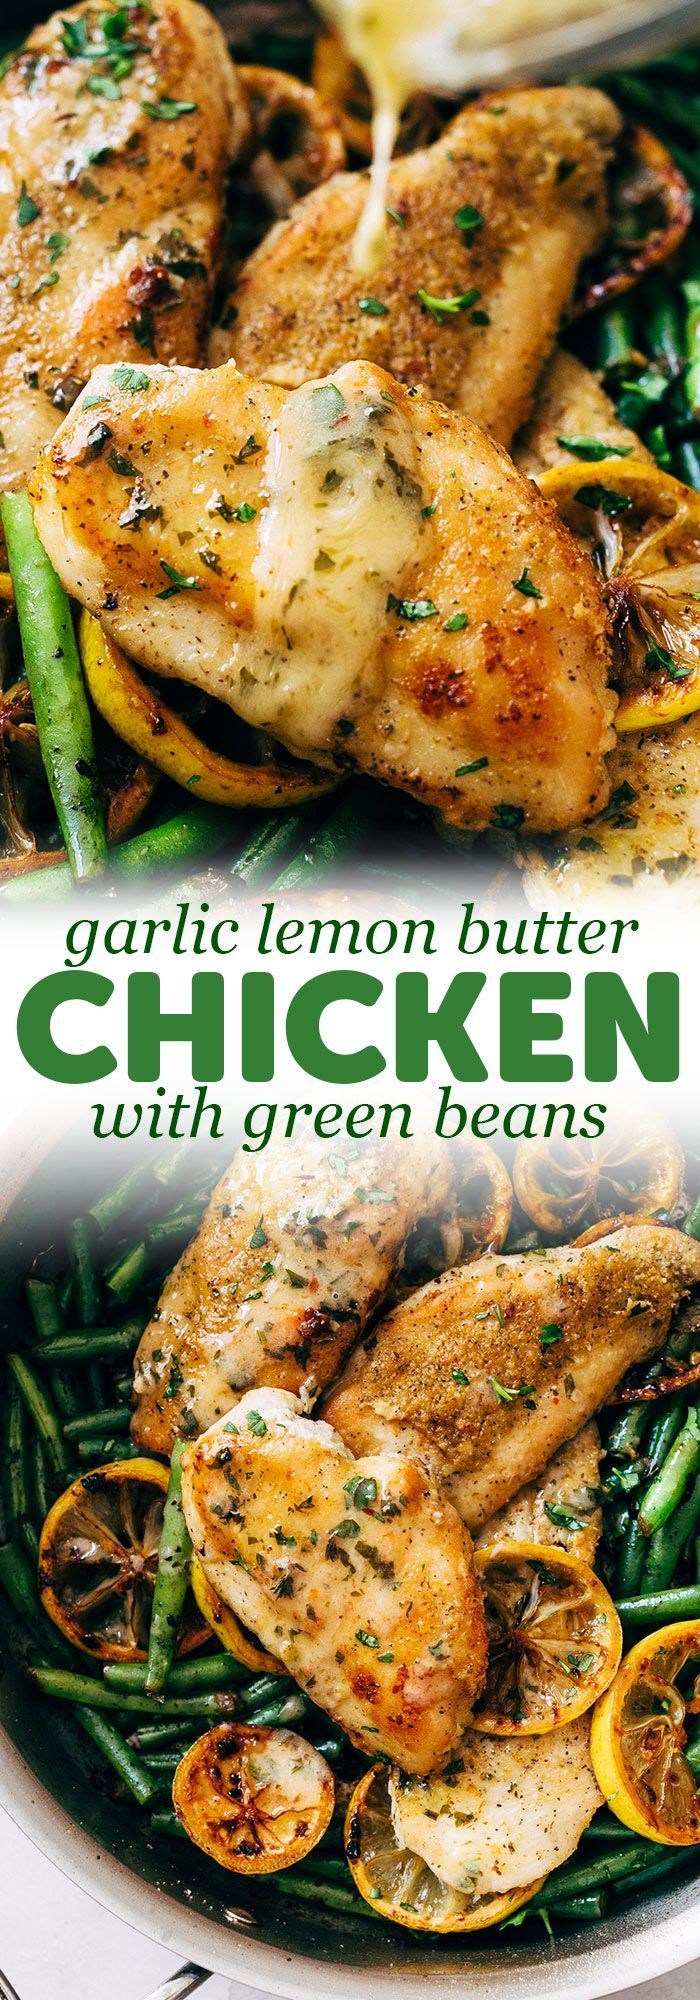 Skillet Garlic Lemon Butter Chicken Recipe | Little Spice Jar